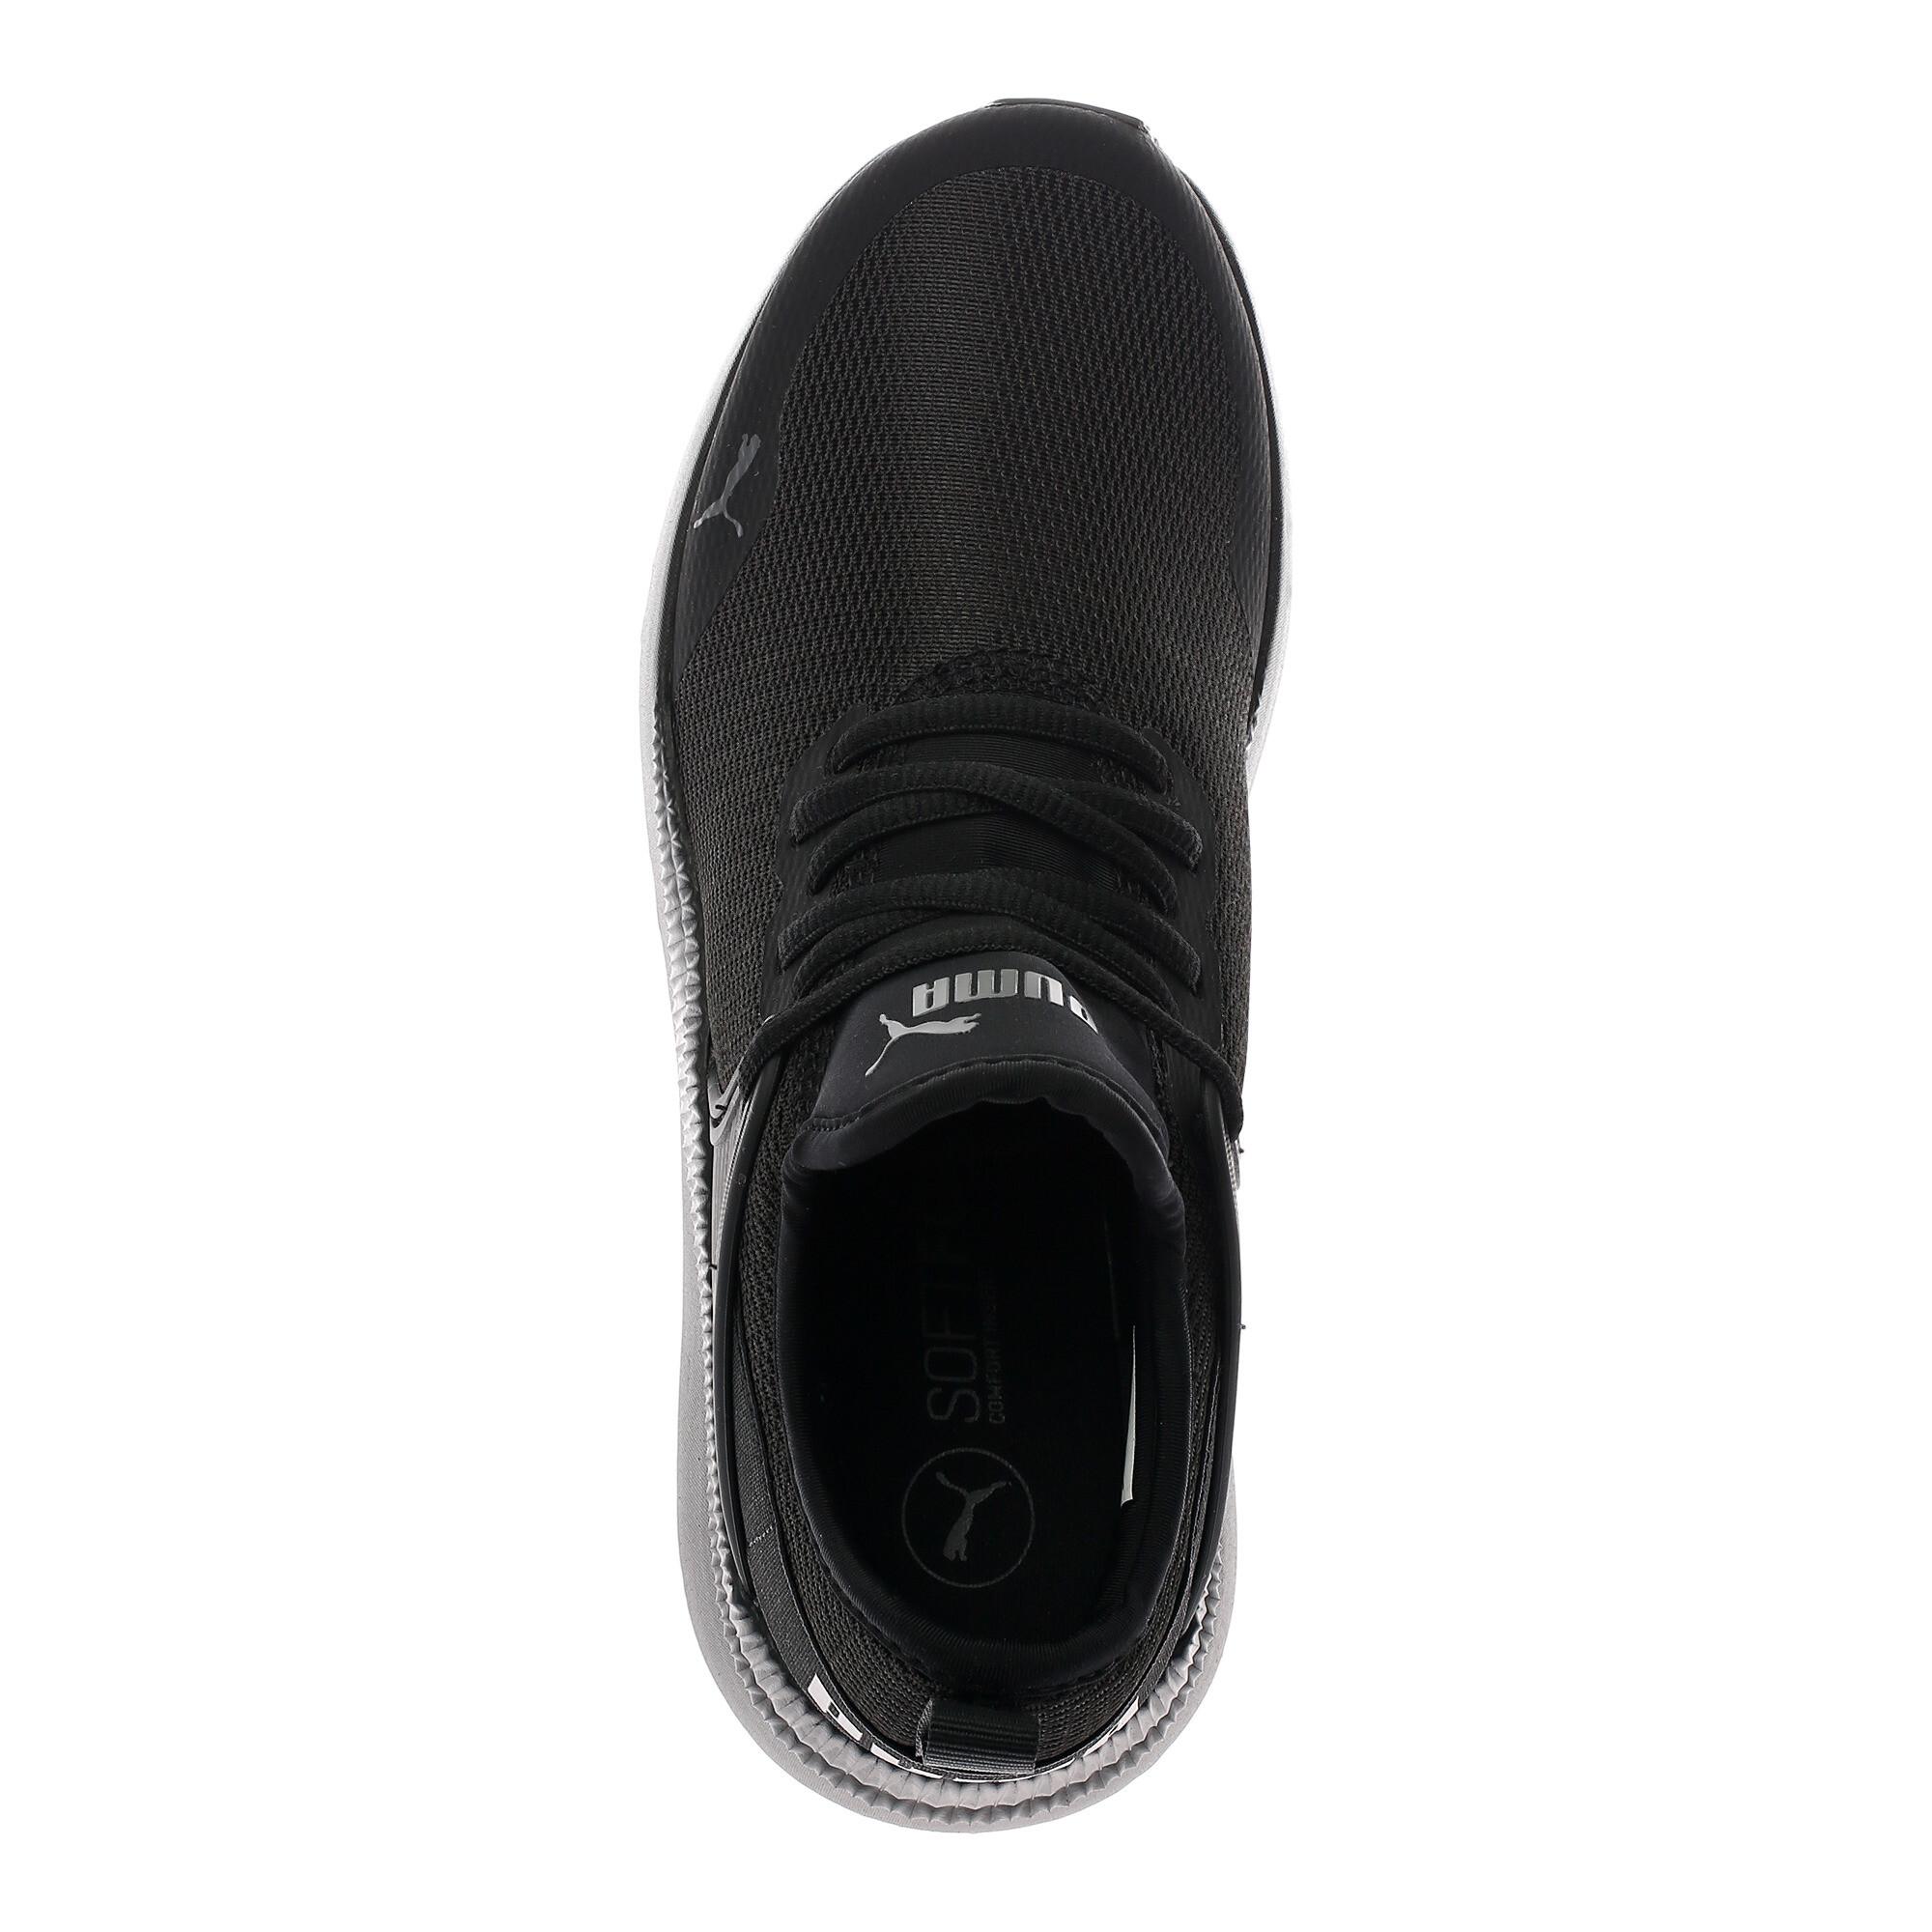 PUMA-Pacer-Next-Cage-Sneakers-JR-Boys-Shoe-Kids thumbnail 6